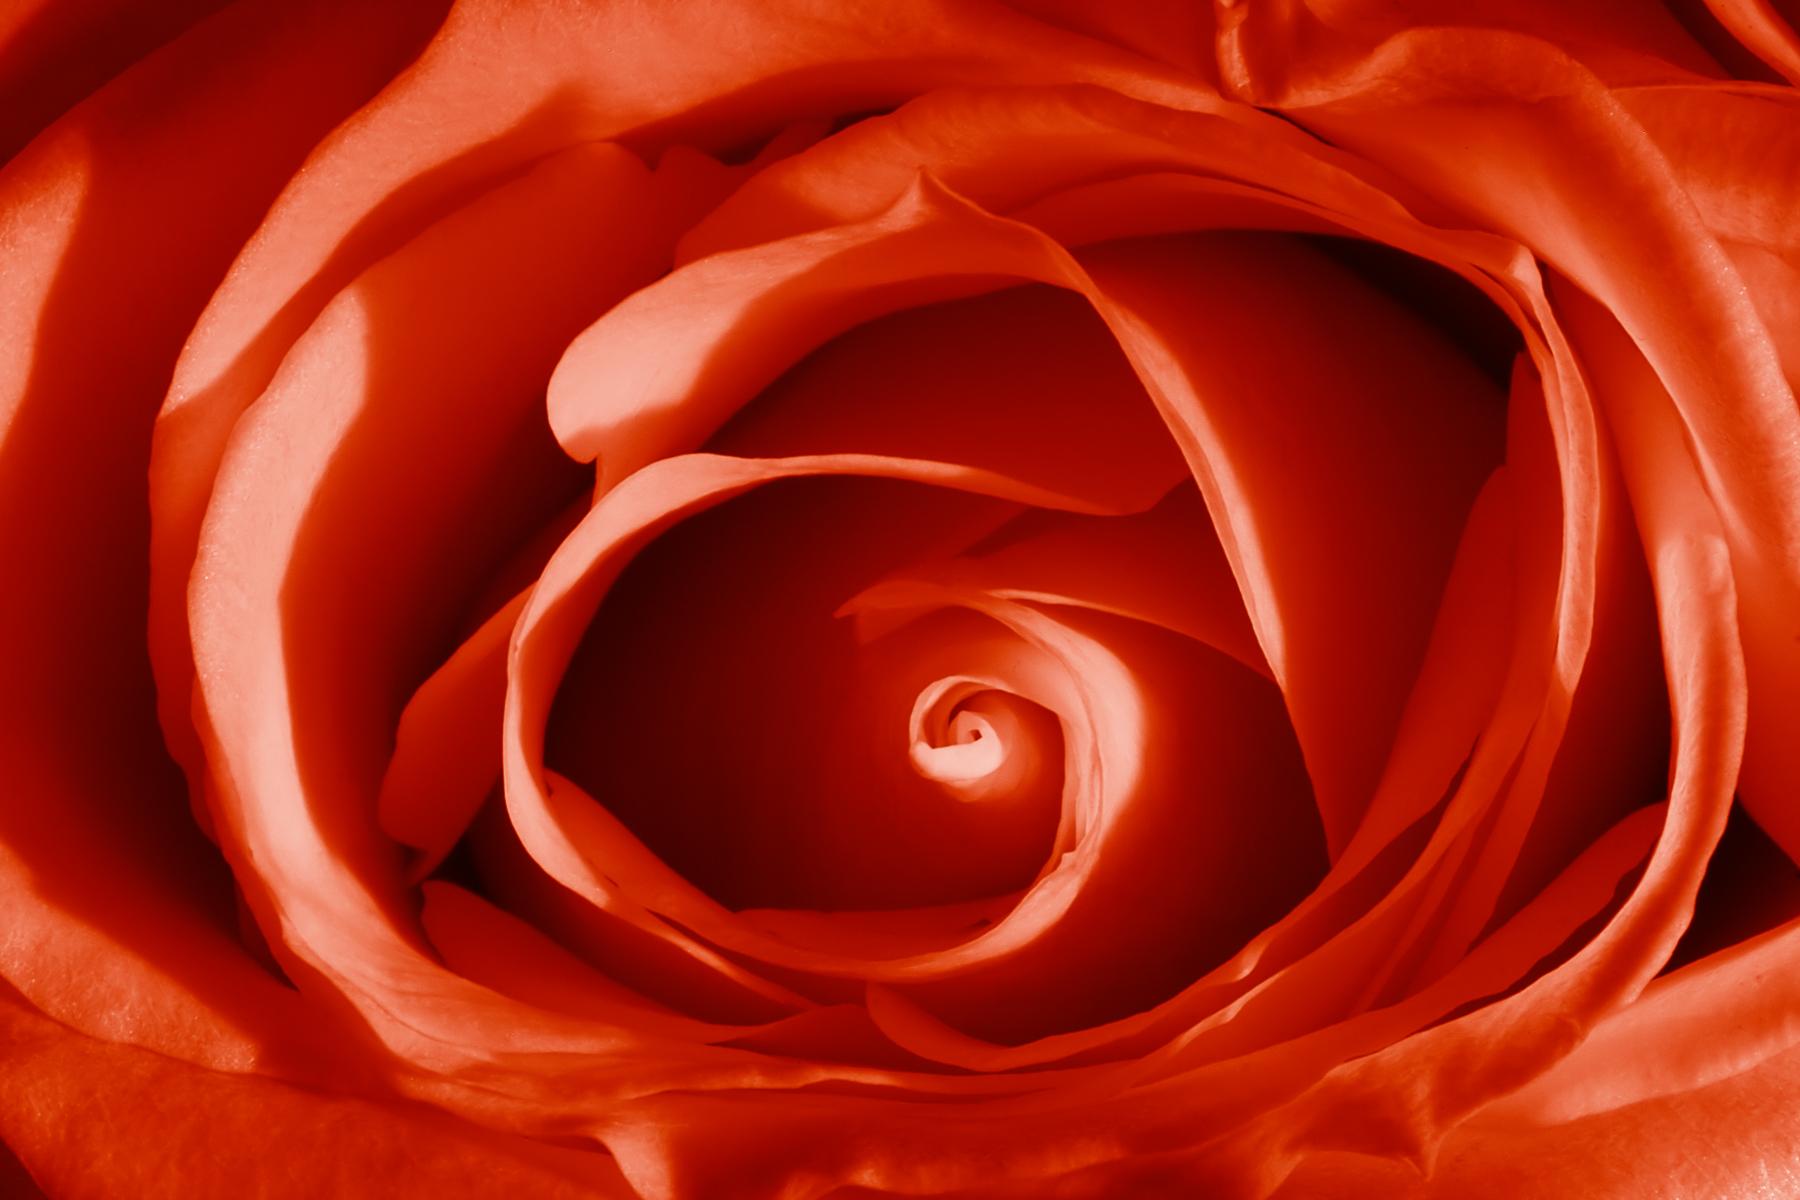 Red Vibrant Rose, Beautiful, Rose, Macro, Petal, HQ Photo